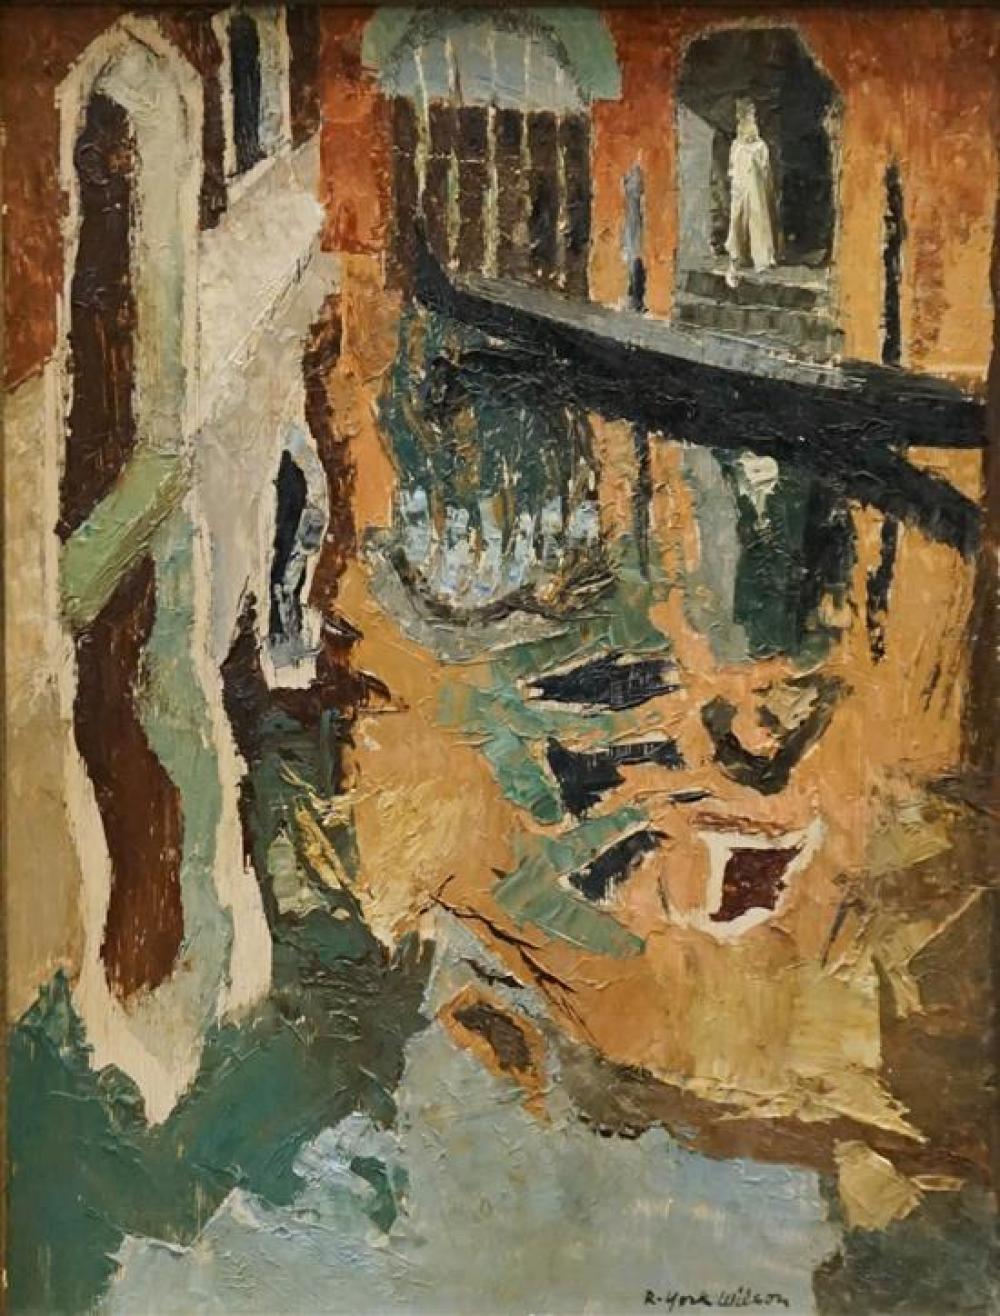 Ronald York Wilson (Canadian 1907-1984), Venetian Reflections, Acrylic on Panel, Frame: 18-1/4 x 14-1/2 in